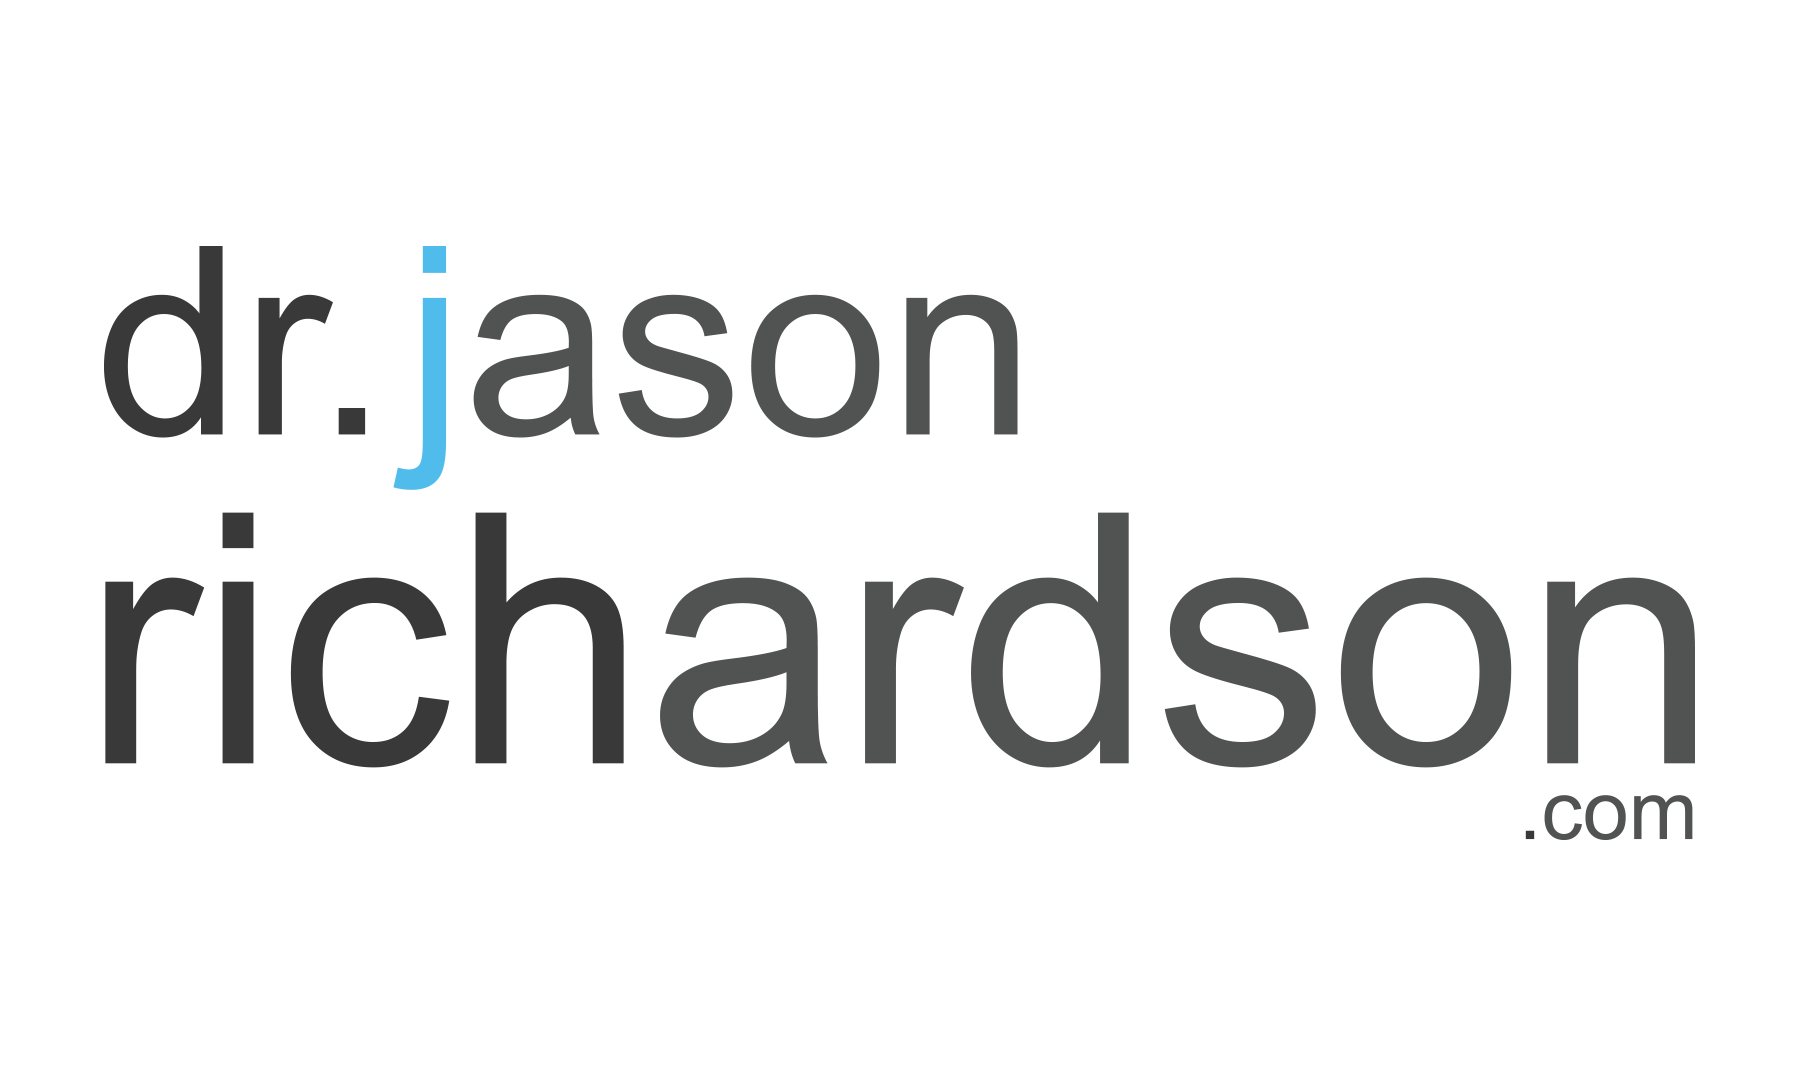 Dr Jason Richardson.com